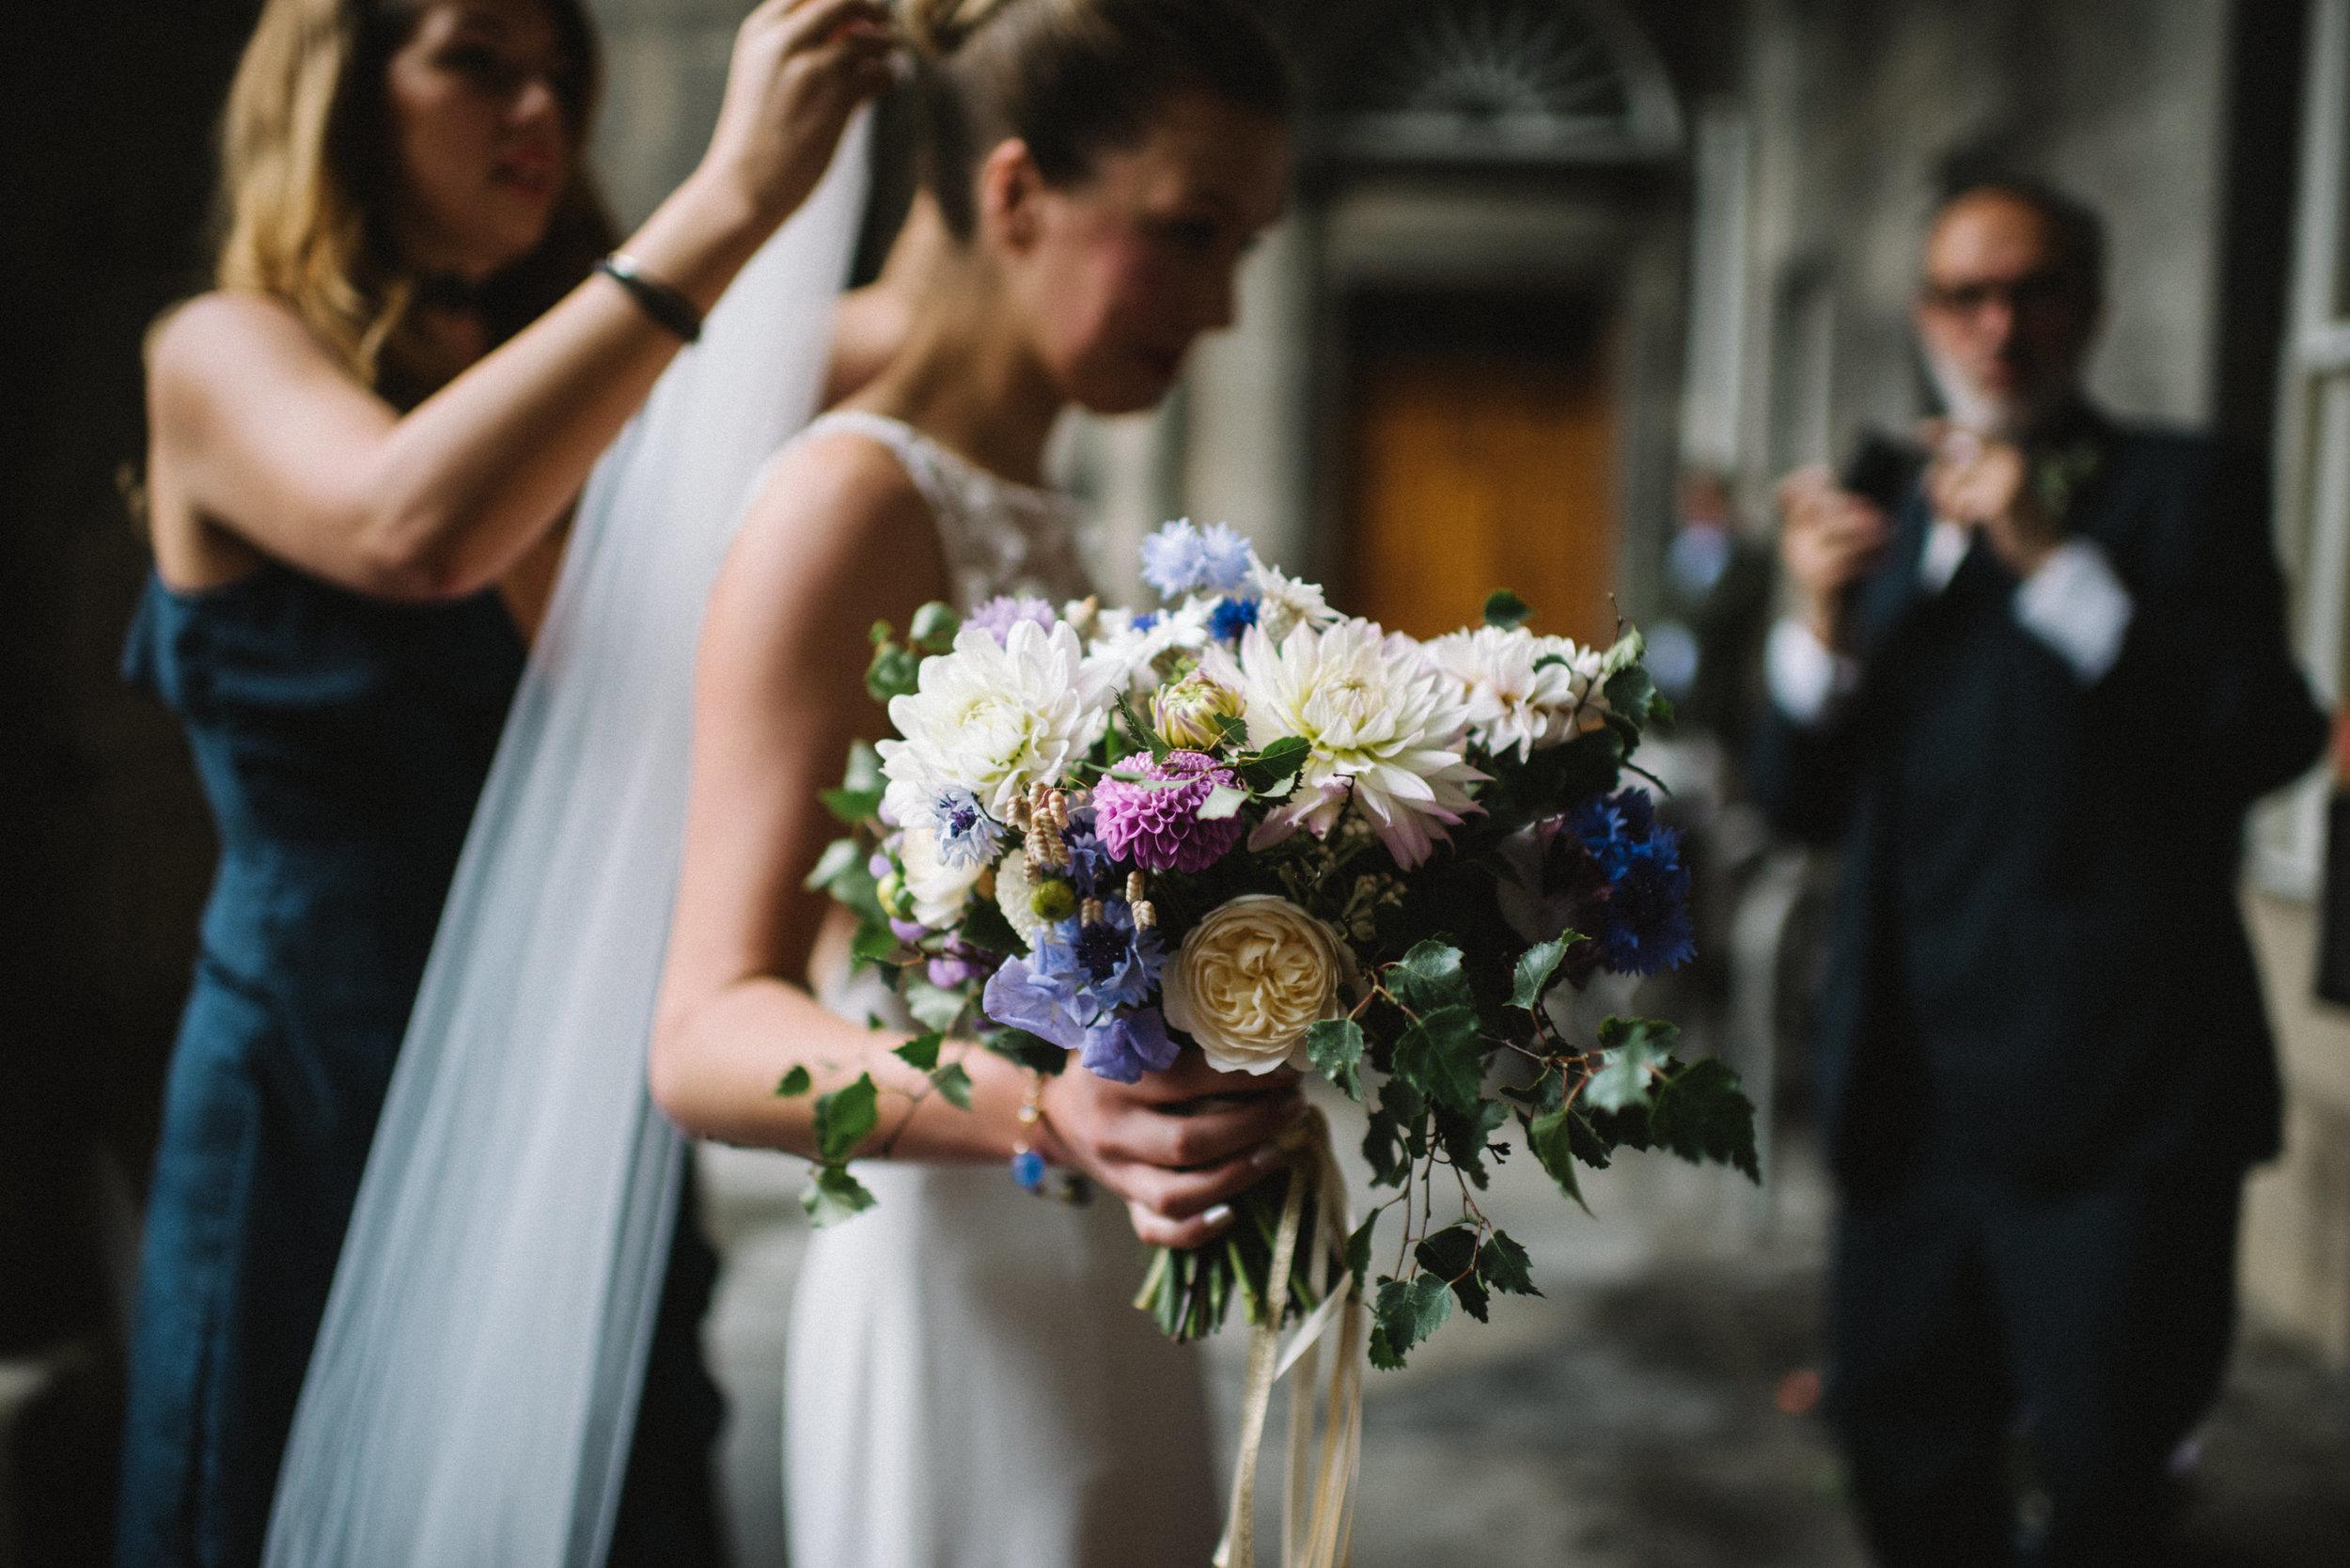 0087-LISA-DEVINE-PHOTOGRAPHY-ALTERNATIVE-WEDDING-PHOTOGRAPHY-SCOTLAND-DESTINATION-WEDDINGS-GLASGOW-WEDDINGS-COOL-WEDDINGS-STYLISH-WEDDINGS.JPG